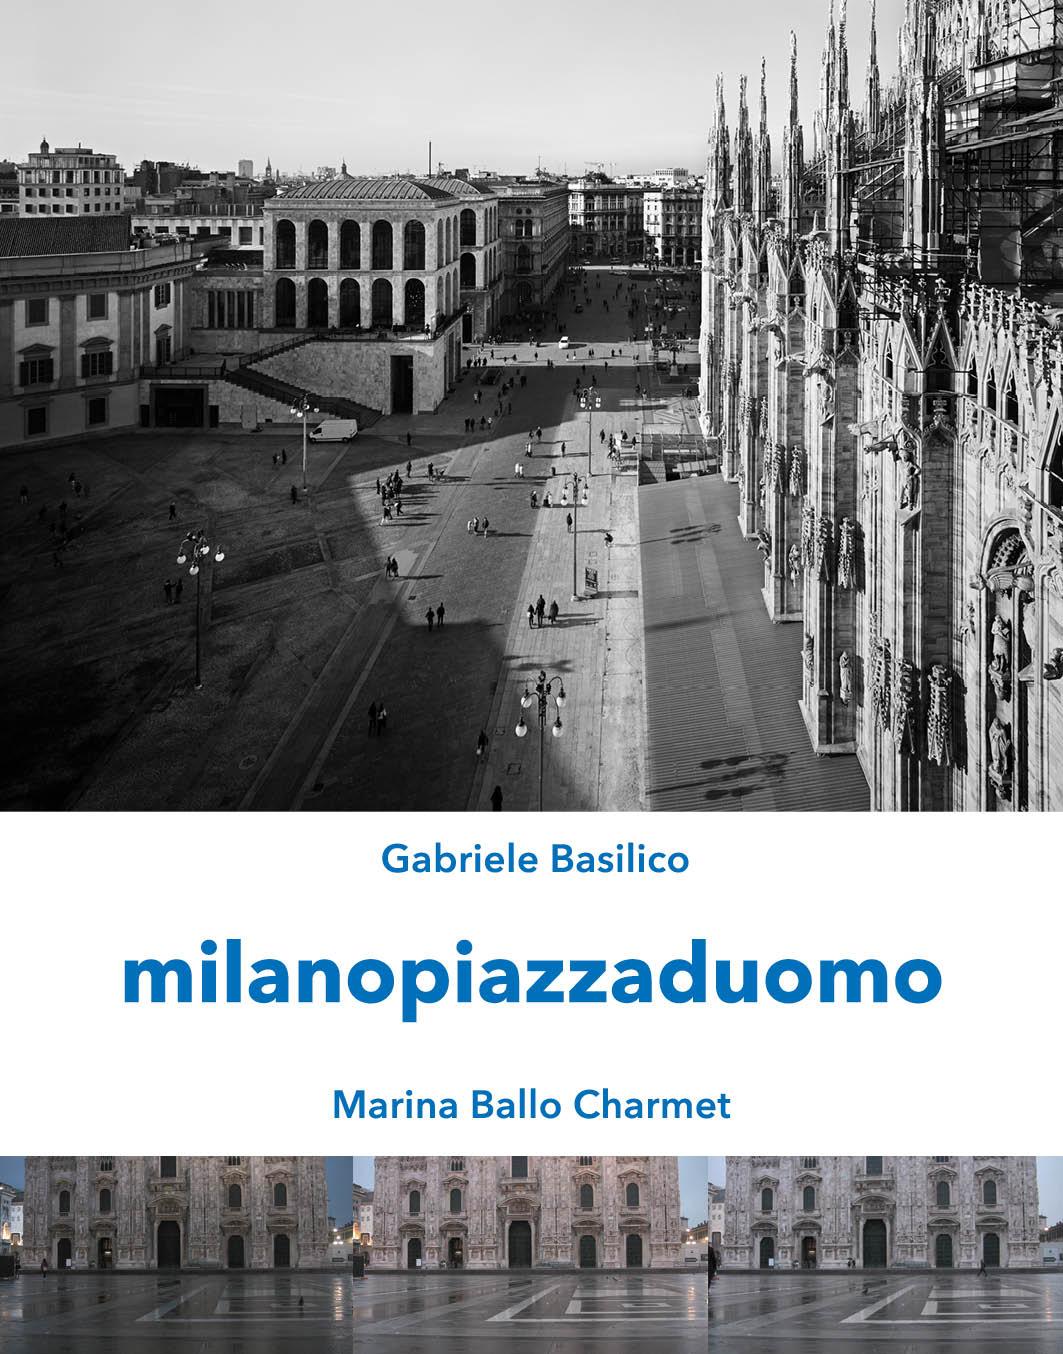 Milanopiazzaduomo